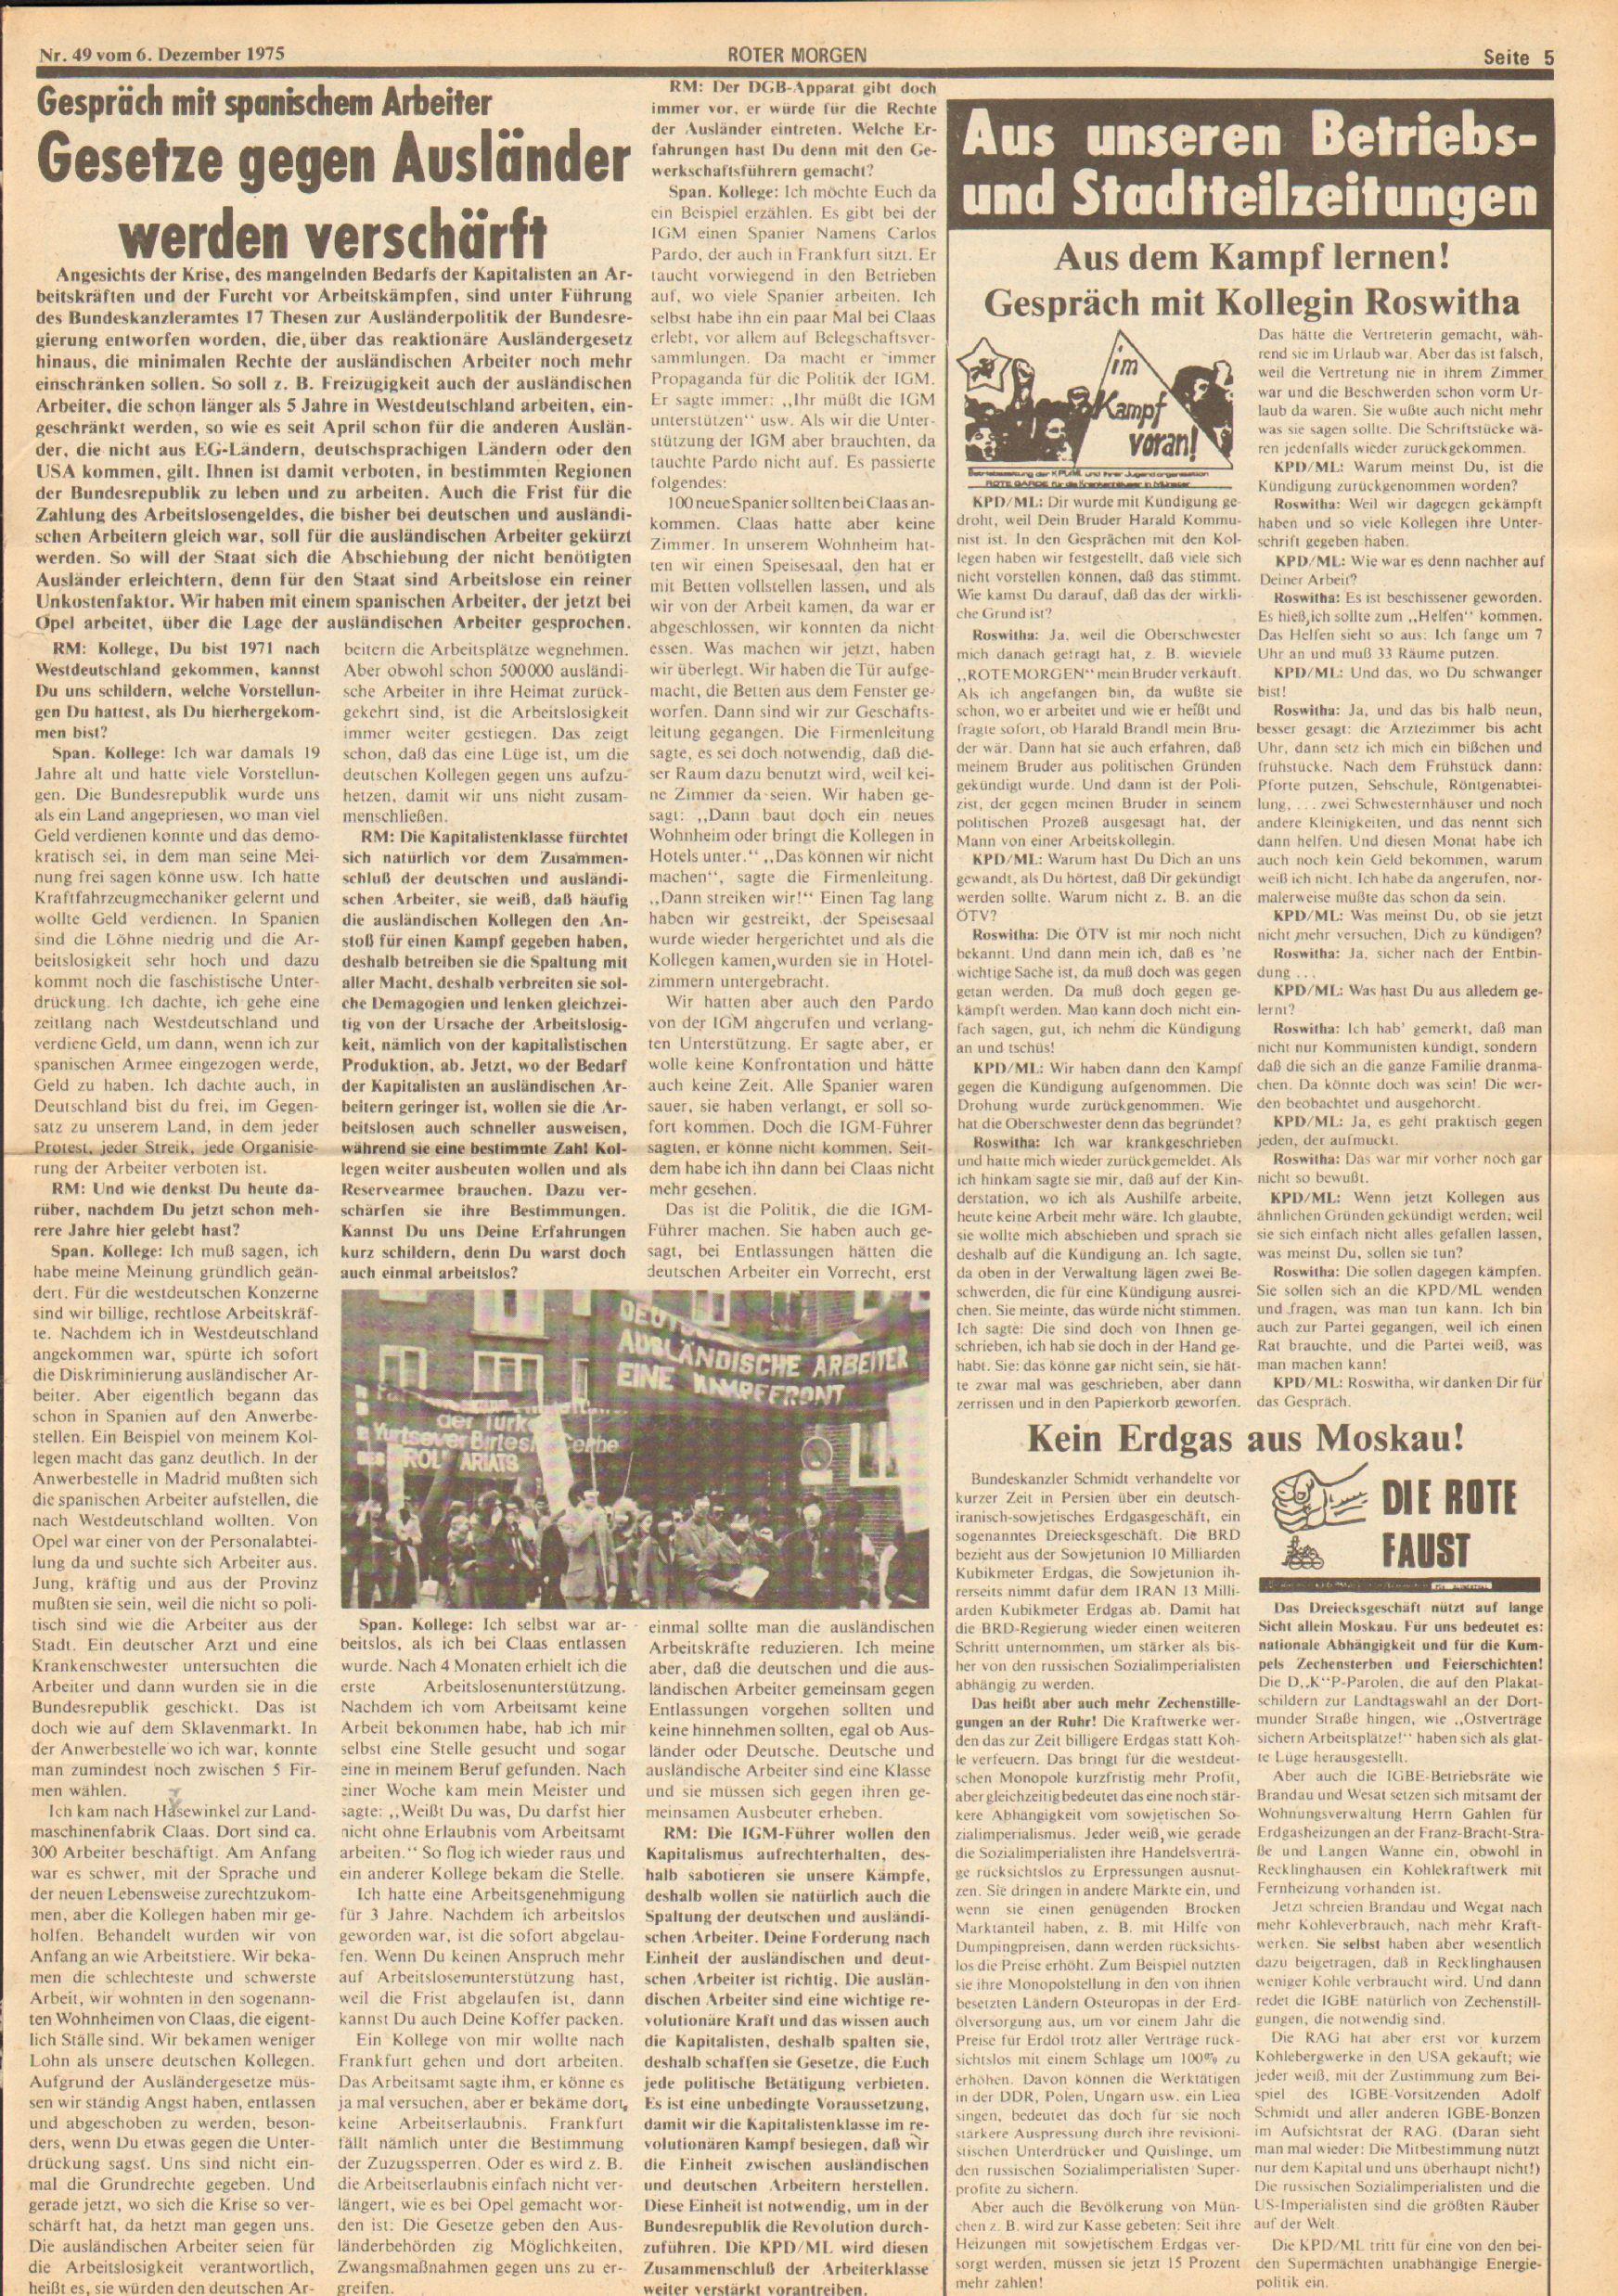 Roter Morgen, 9. Jg., 6. Dezember 1975, Nr. 49, Seite 5